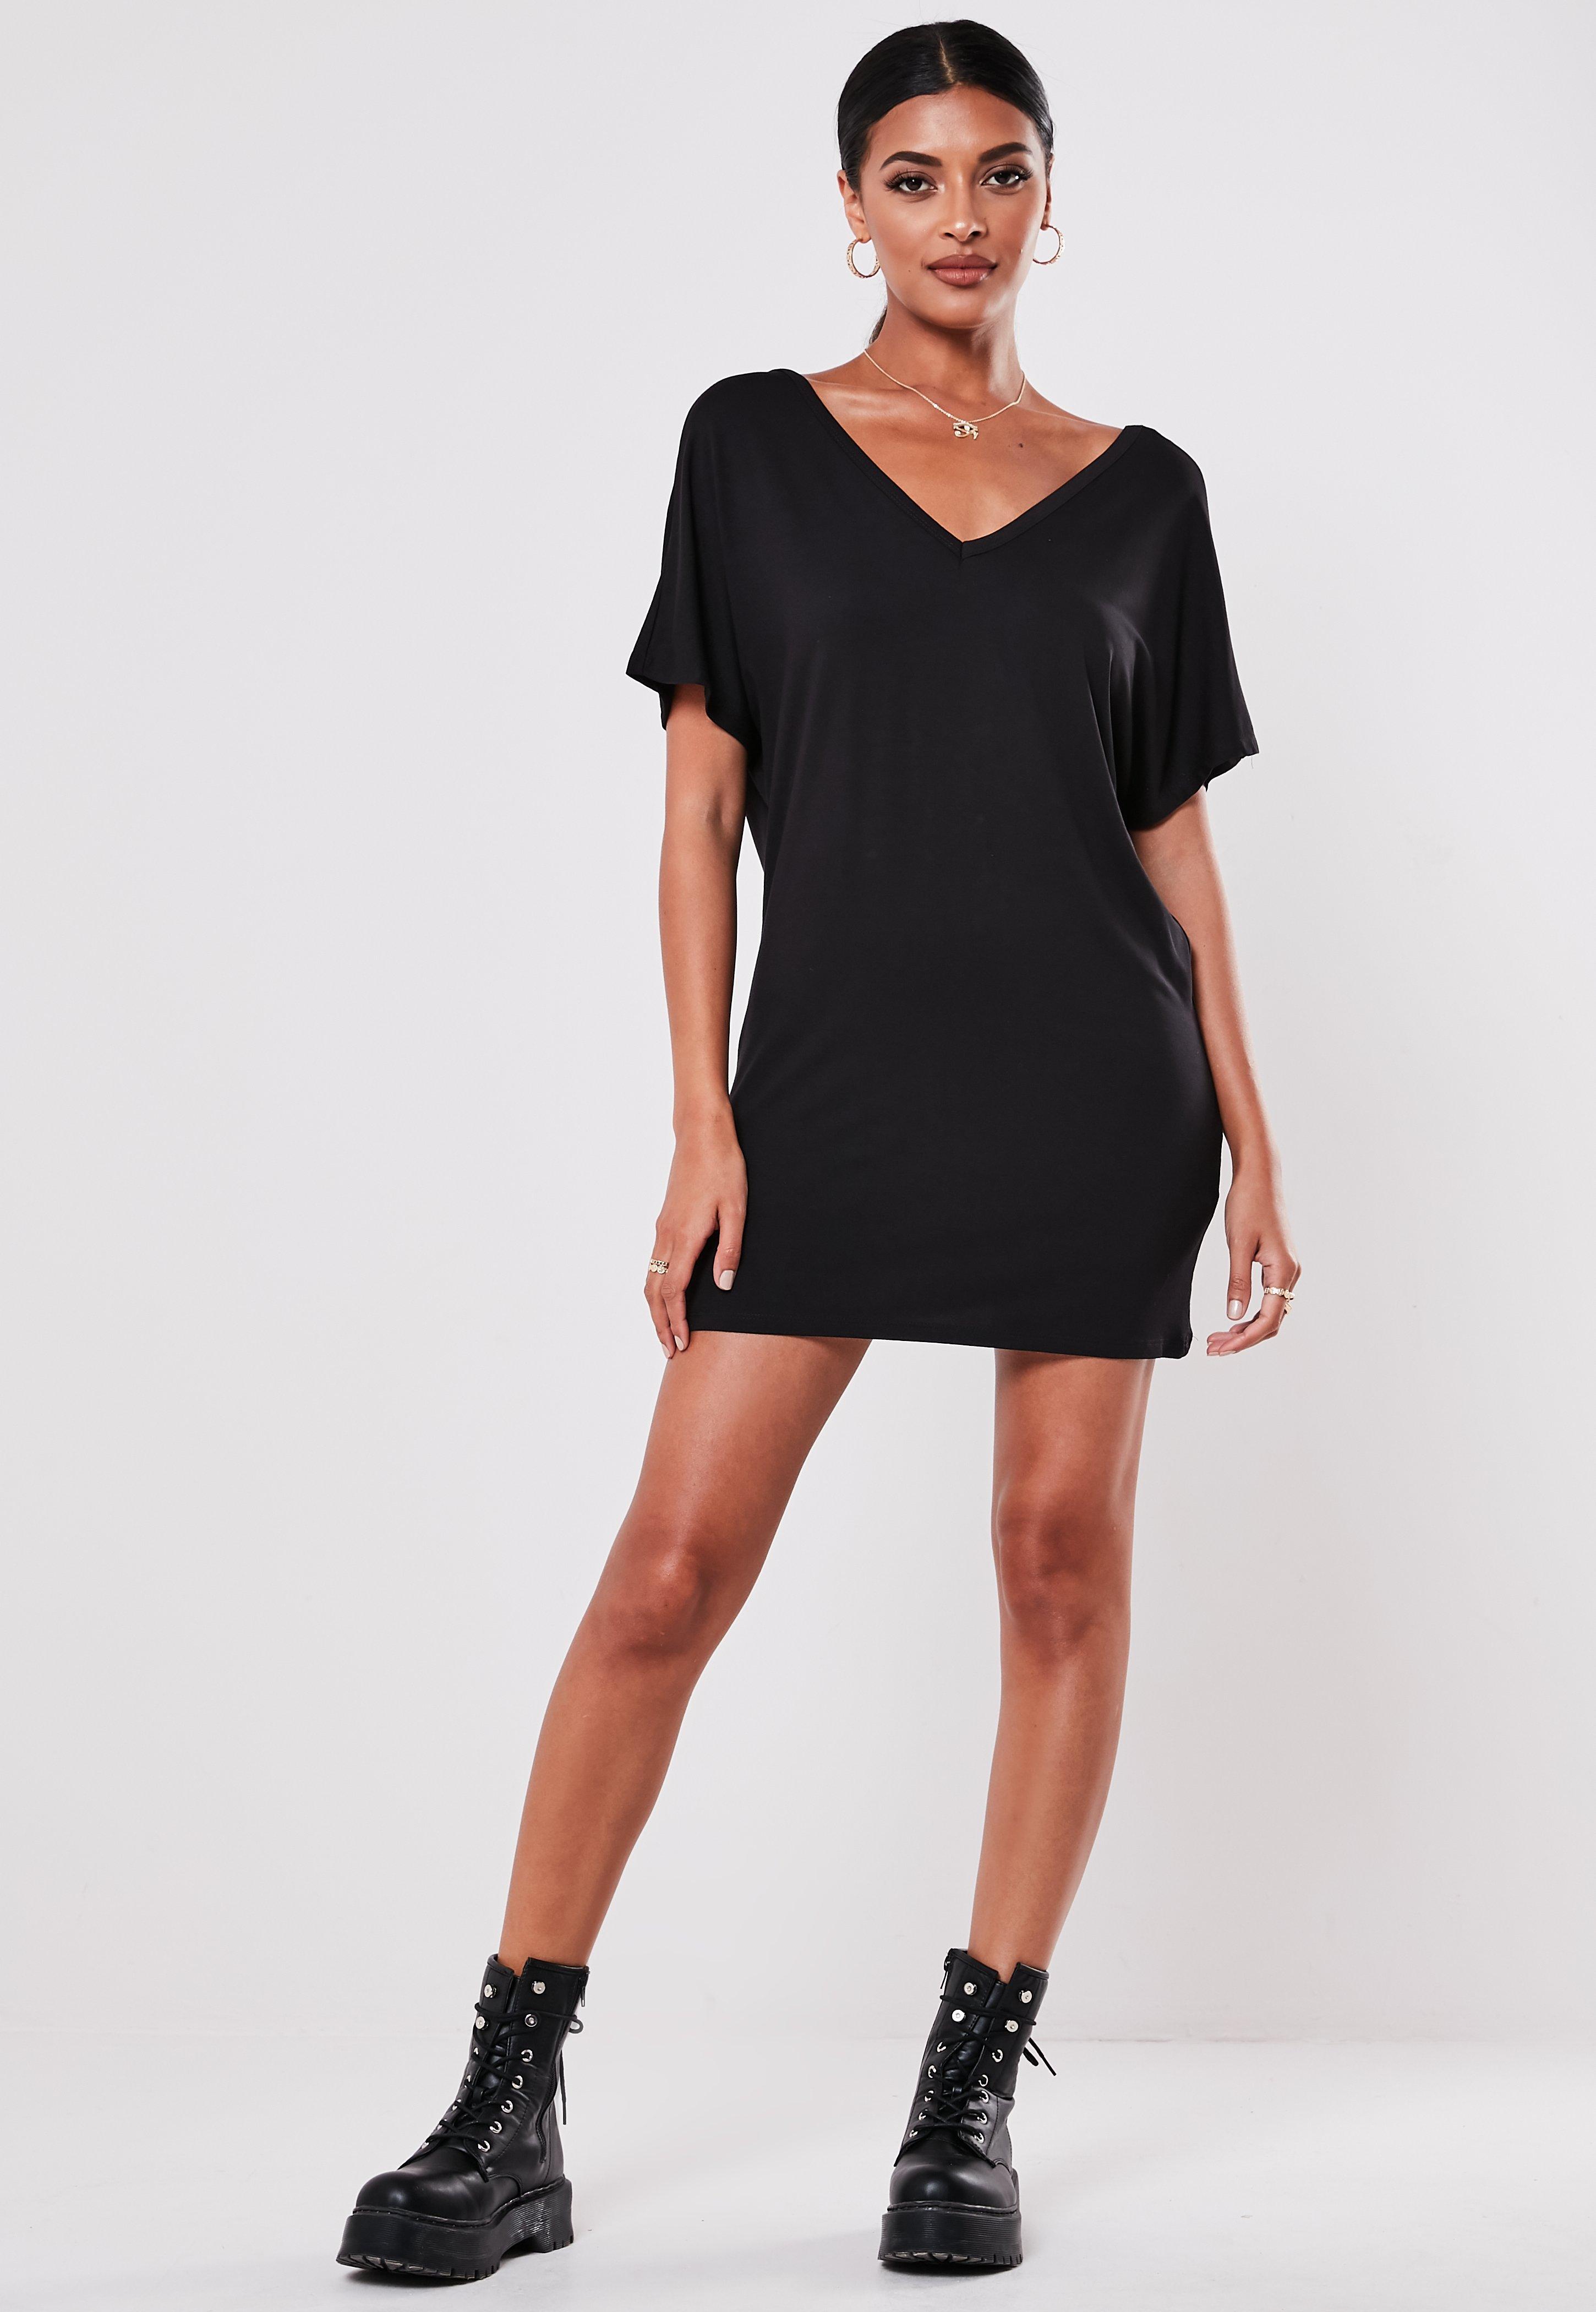 57ba24b912ca9 T Shirt Dresses | Printed & Slogan T-Shirt Dresses - Missguided